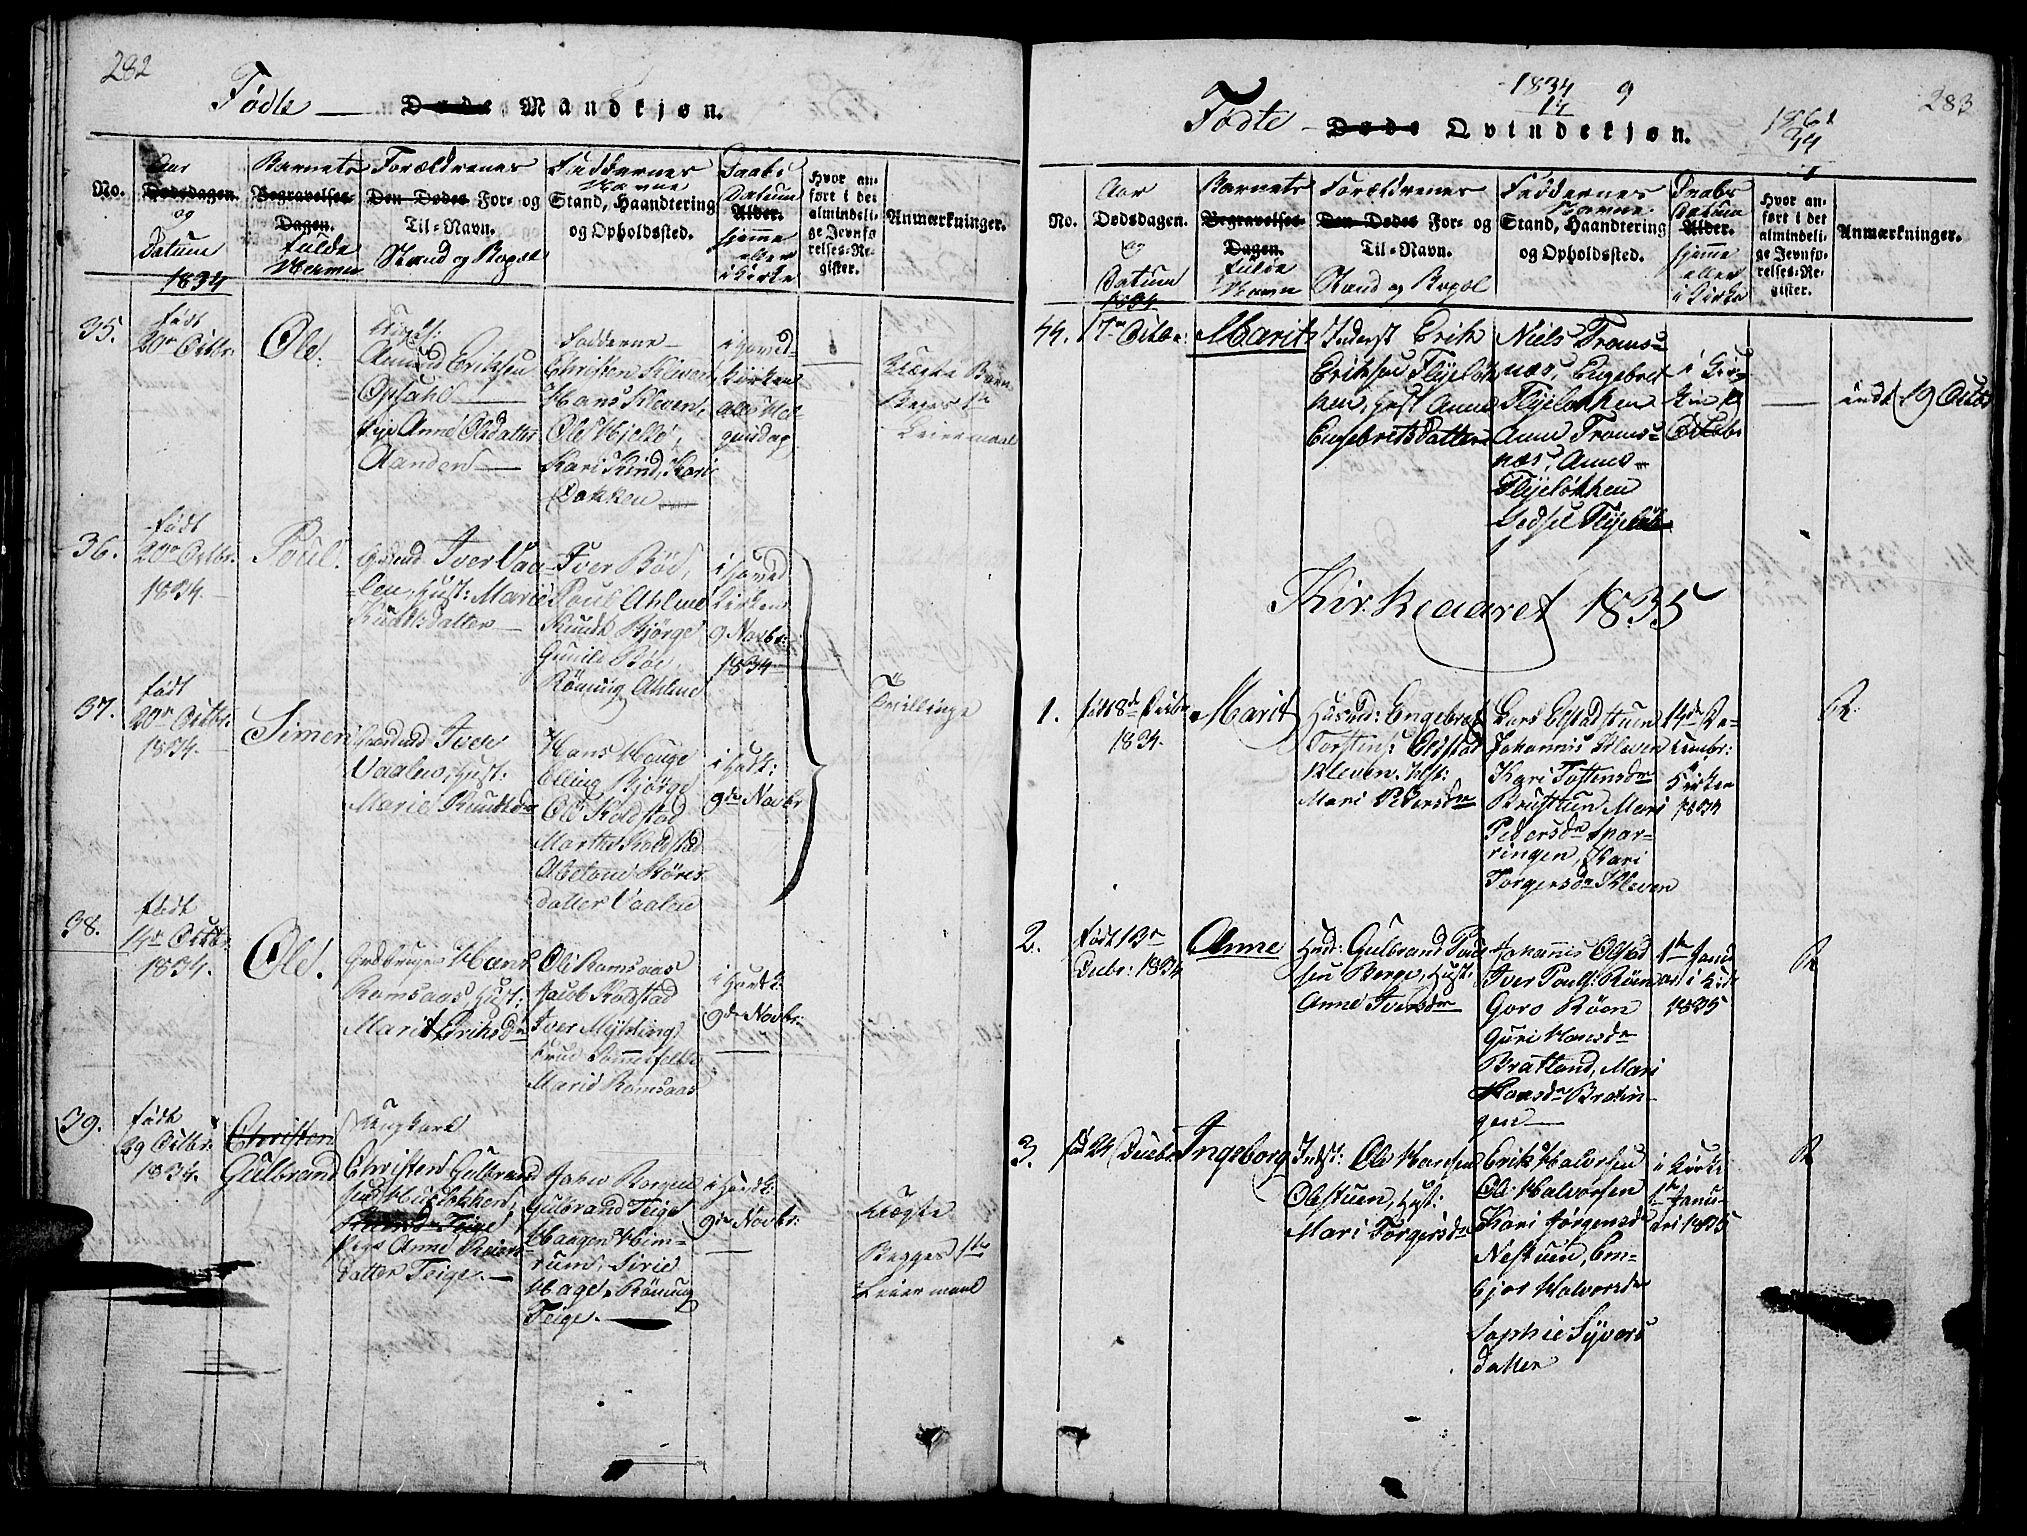 SAH, Ringebu prestekontor, Klokkerbok nr. 1, 1821-1839, s. 282-283